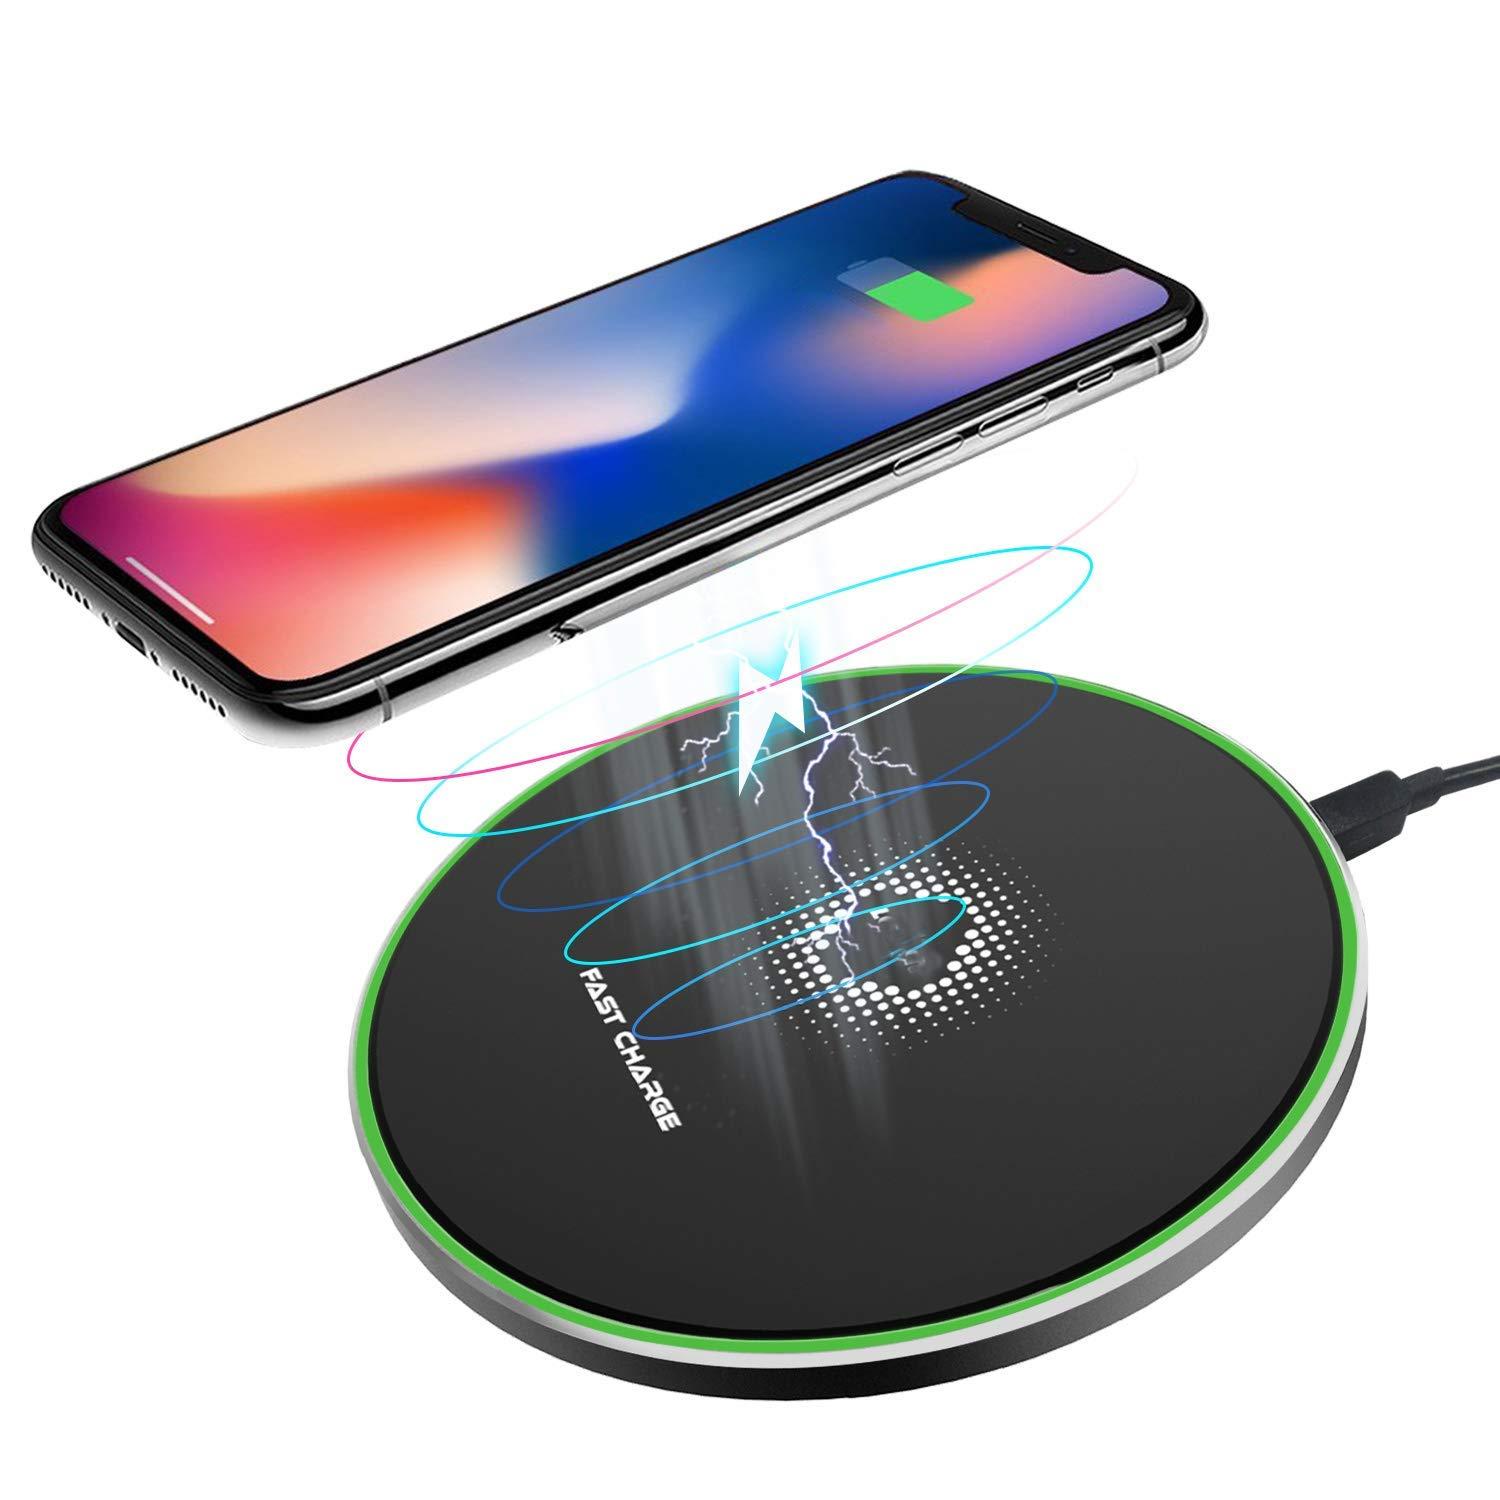 LOBKIN Qi Wireless Charger, Black